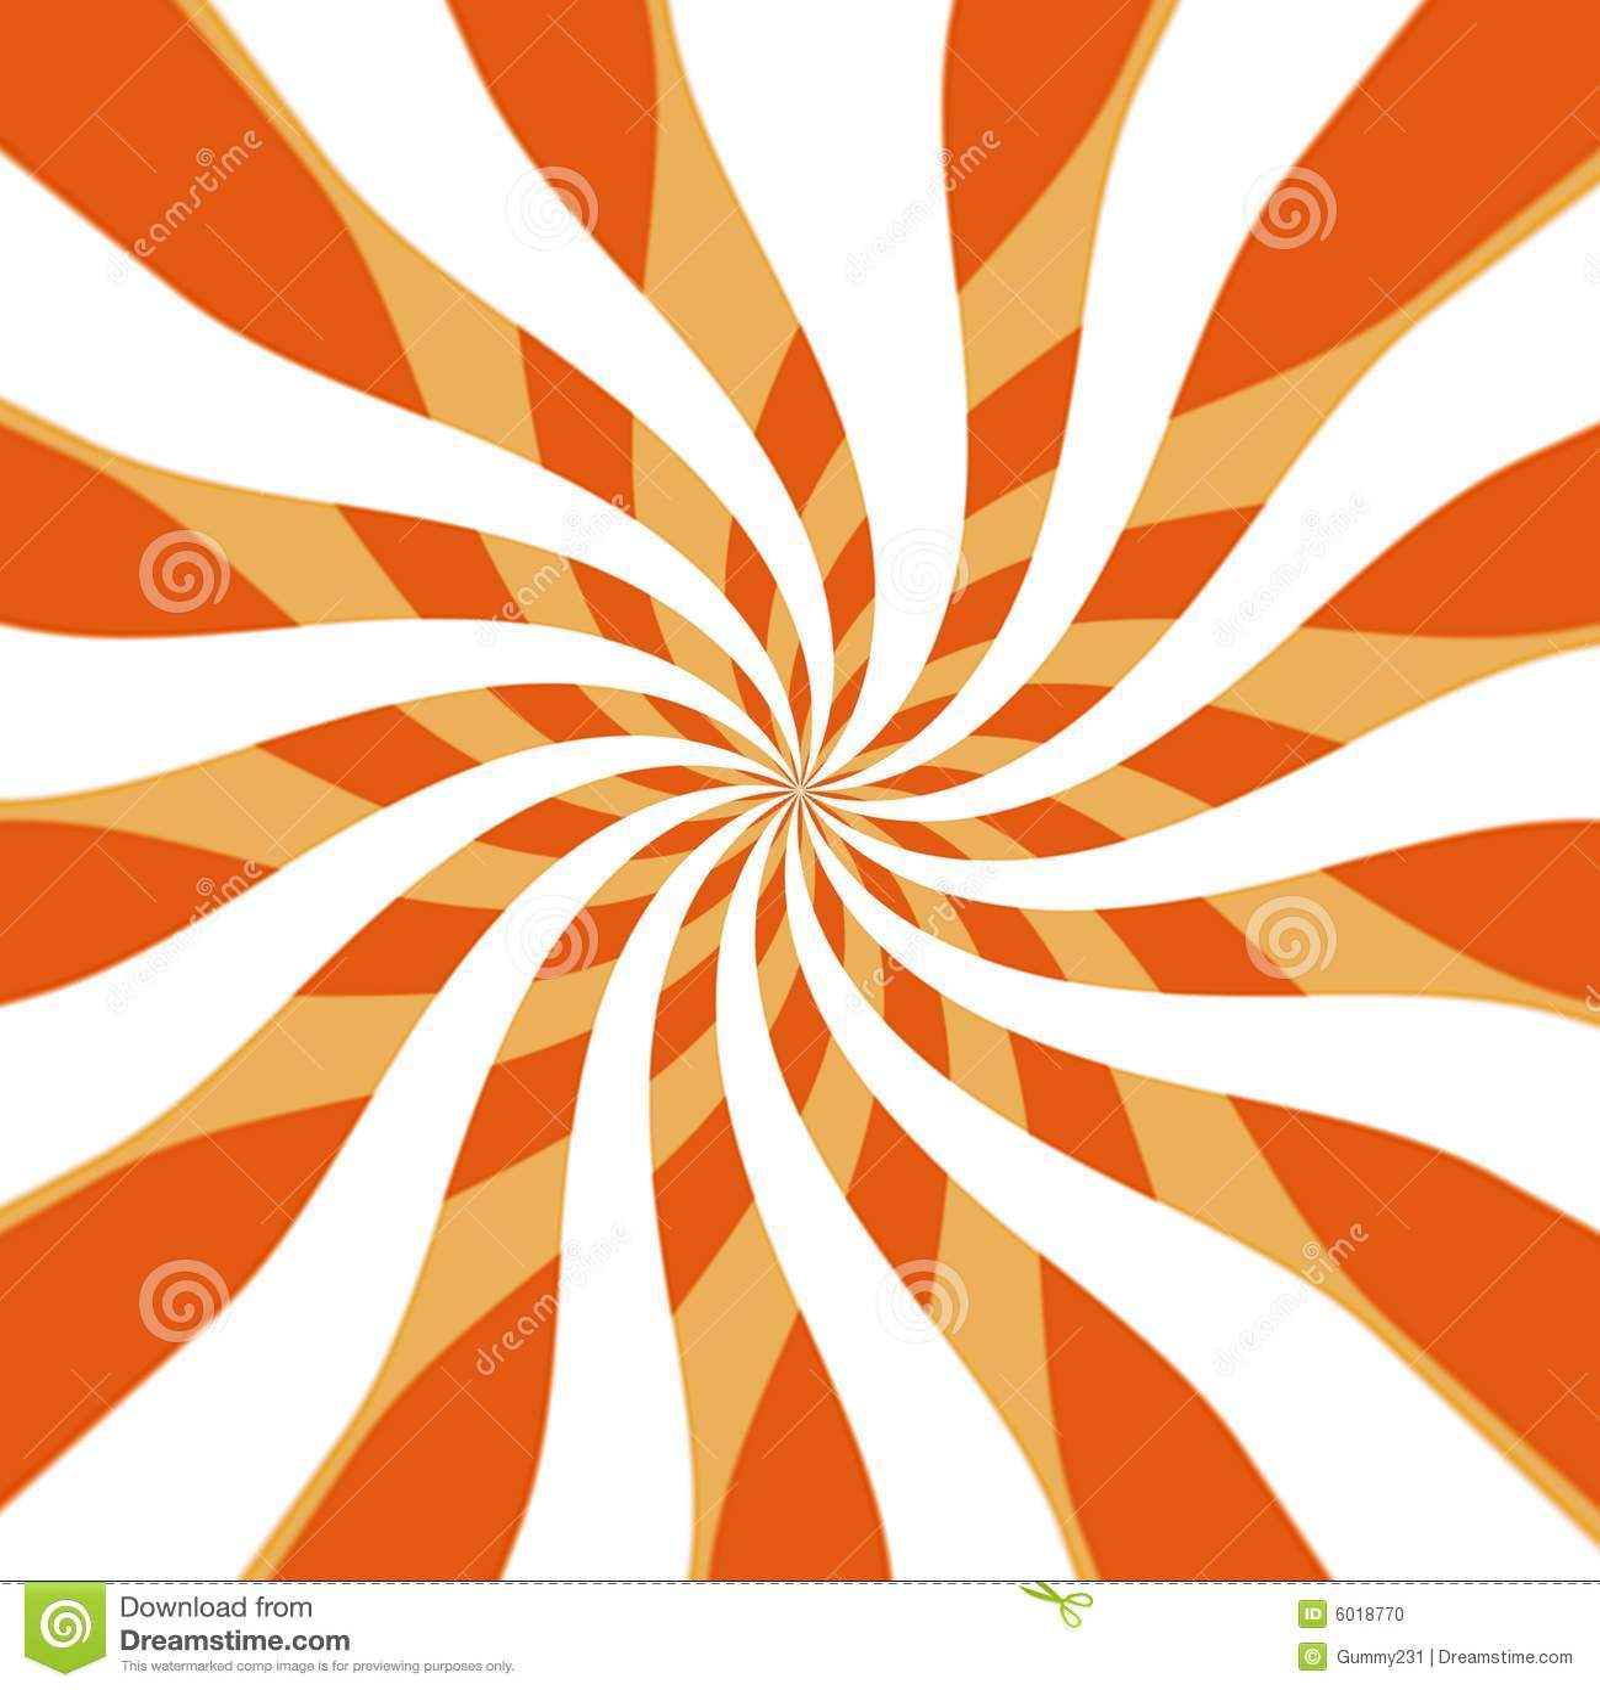 Pretty Abstract Swirl Design Stock Photo - Image: 6018770